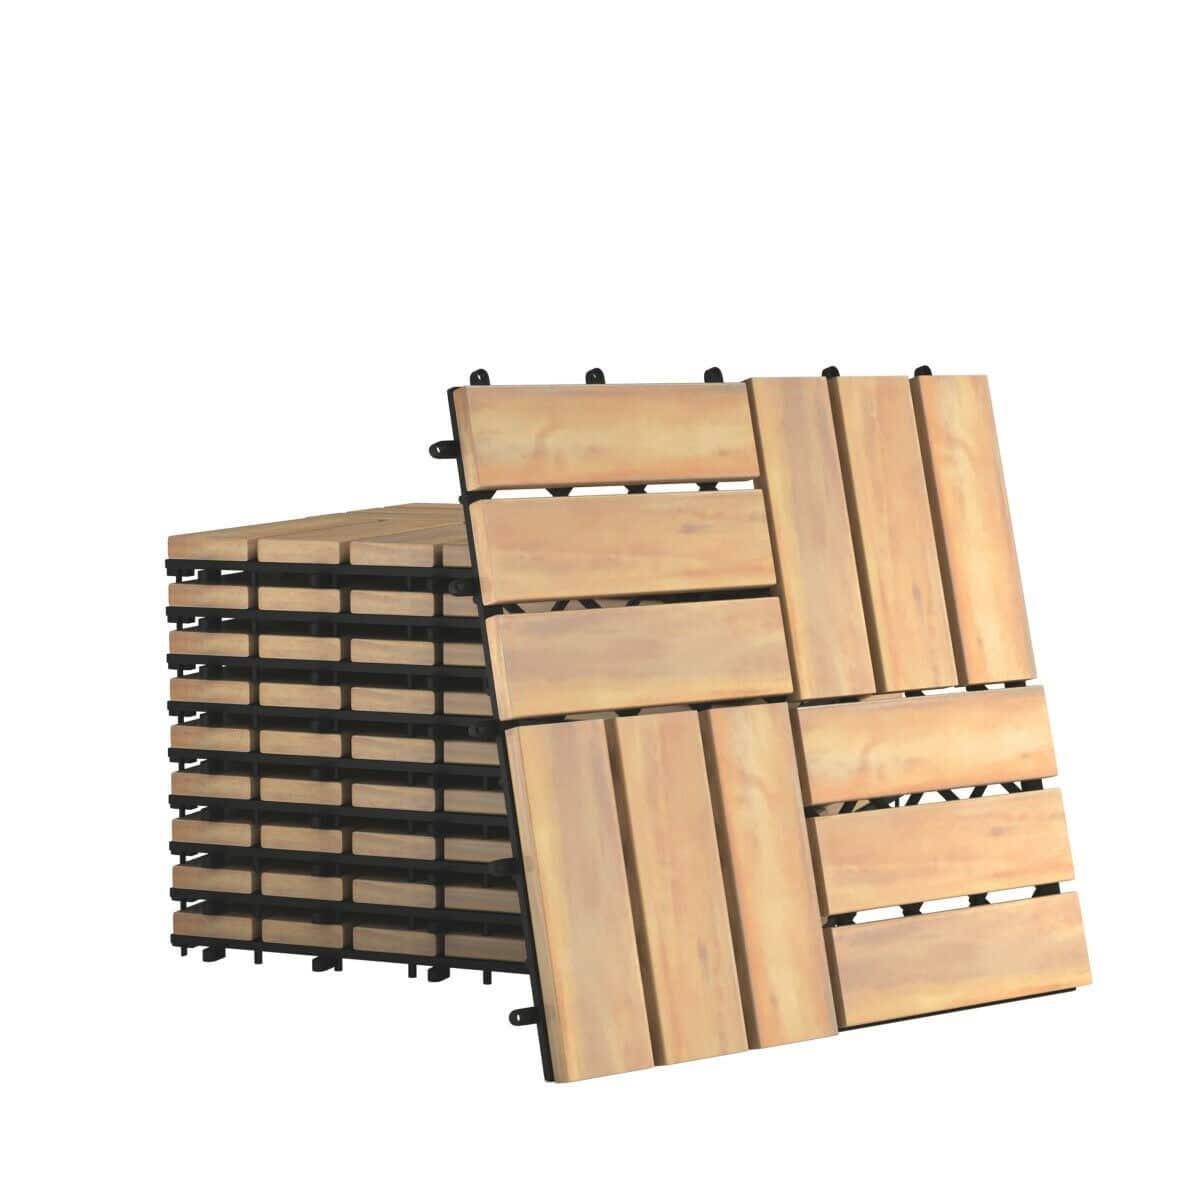 "10 PCS 12"" x 12"" Acacia Wood Interlocking Check Deck Tiles $48.95 +FS"